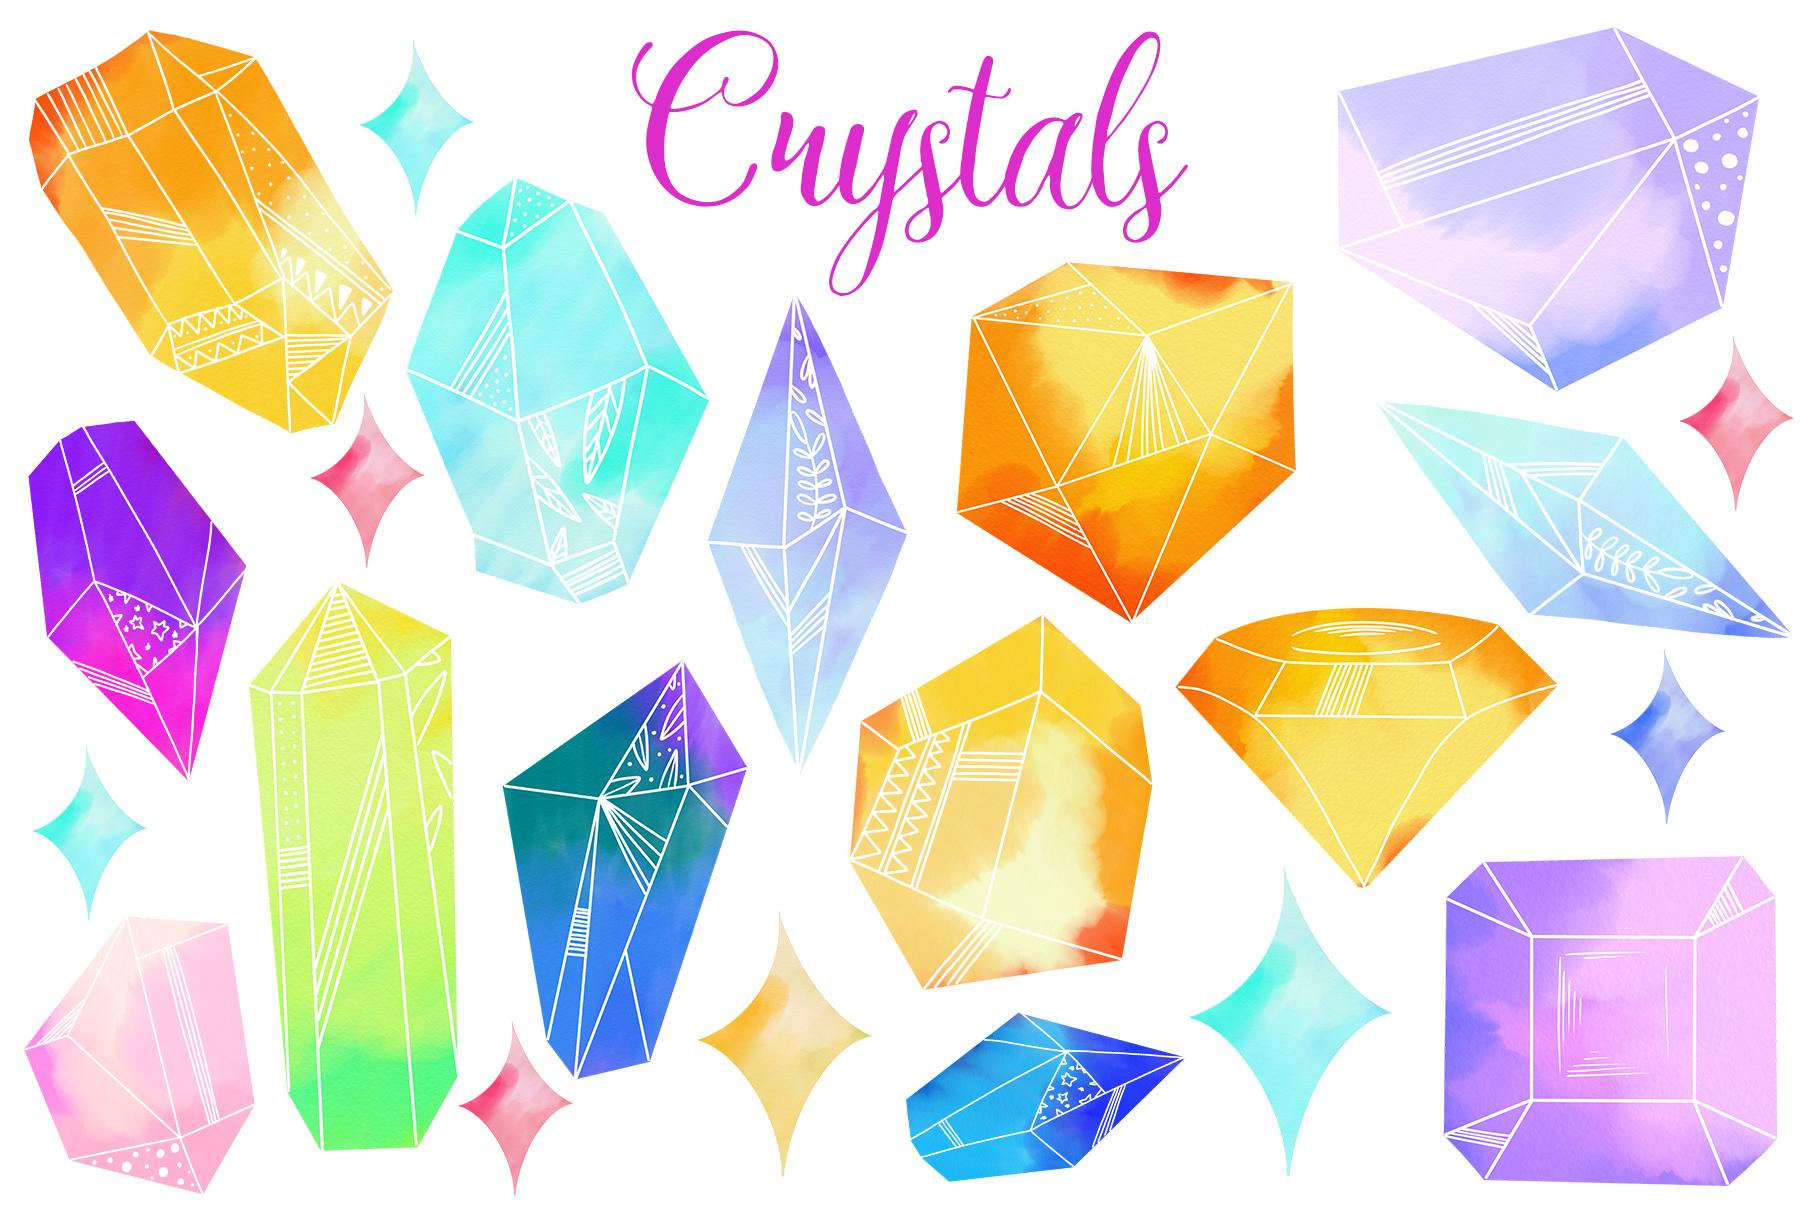 Watercolor Crystals example image 2